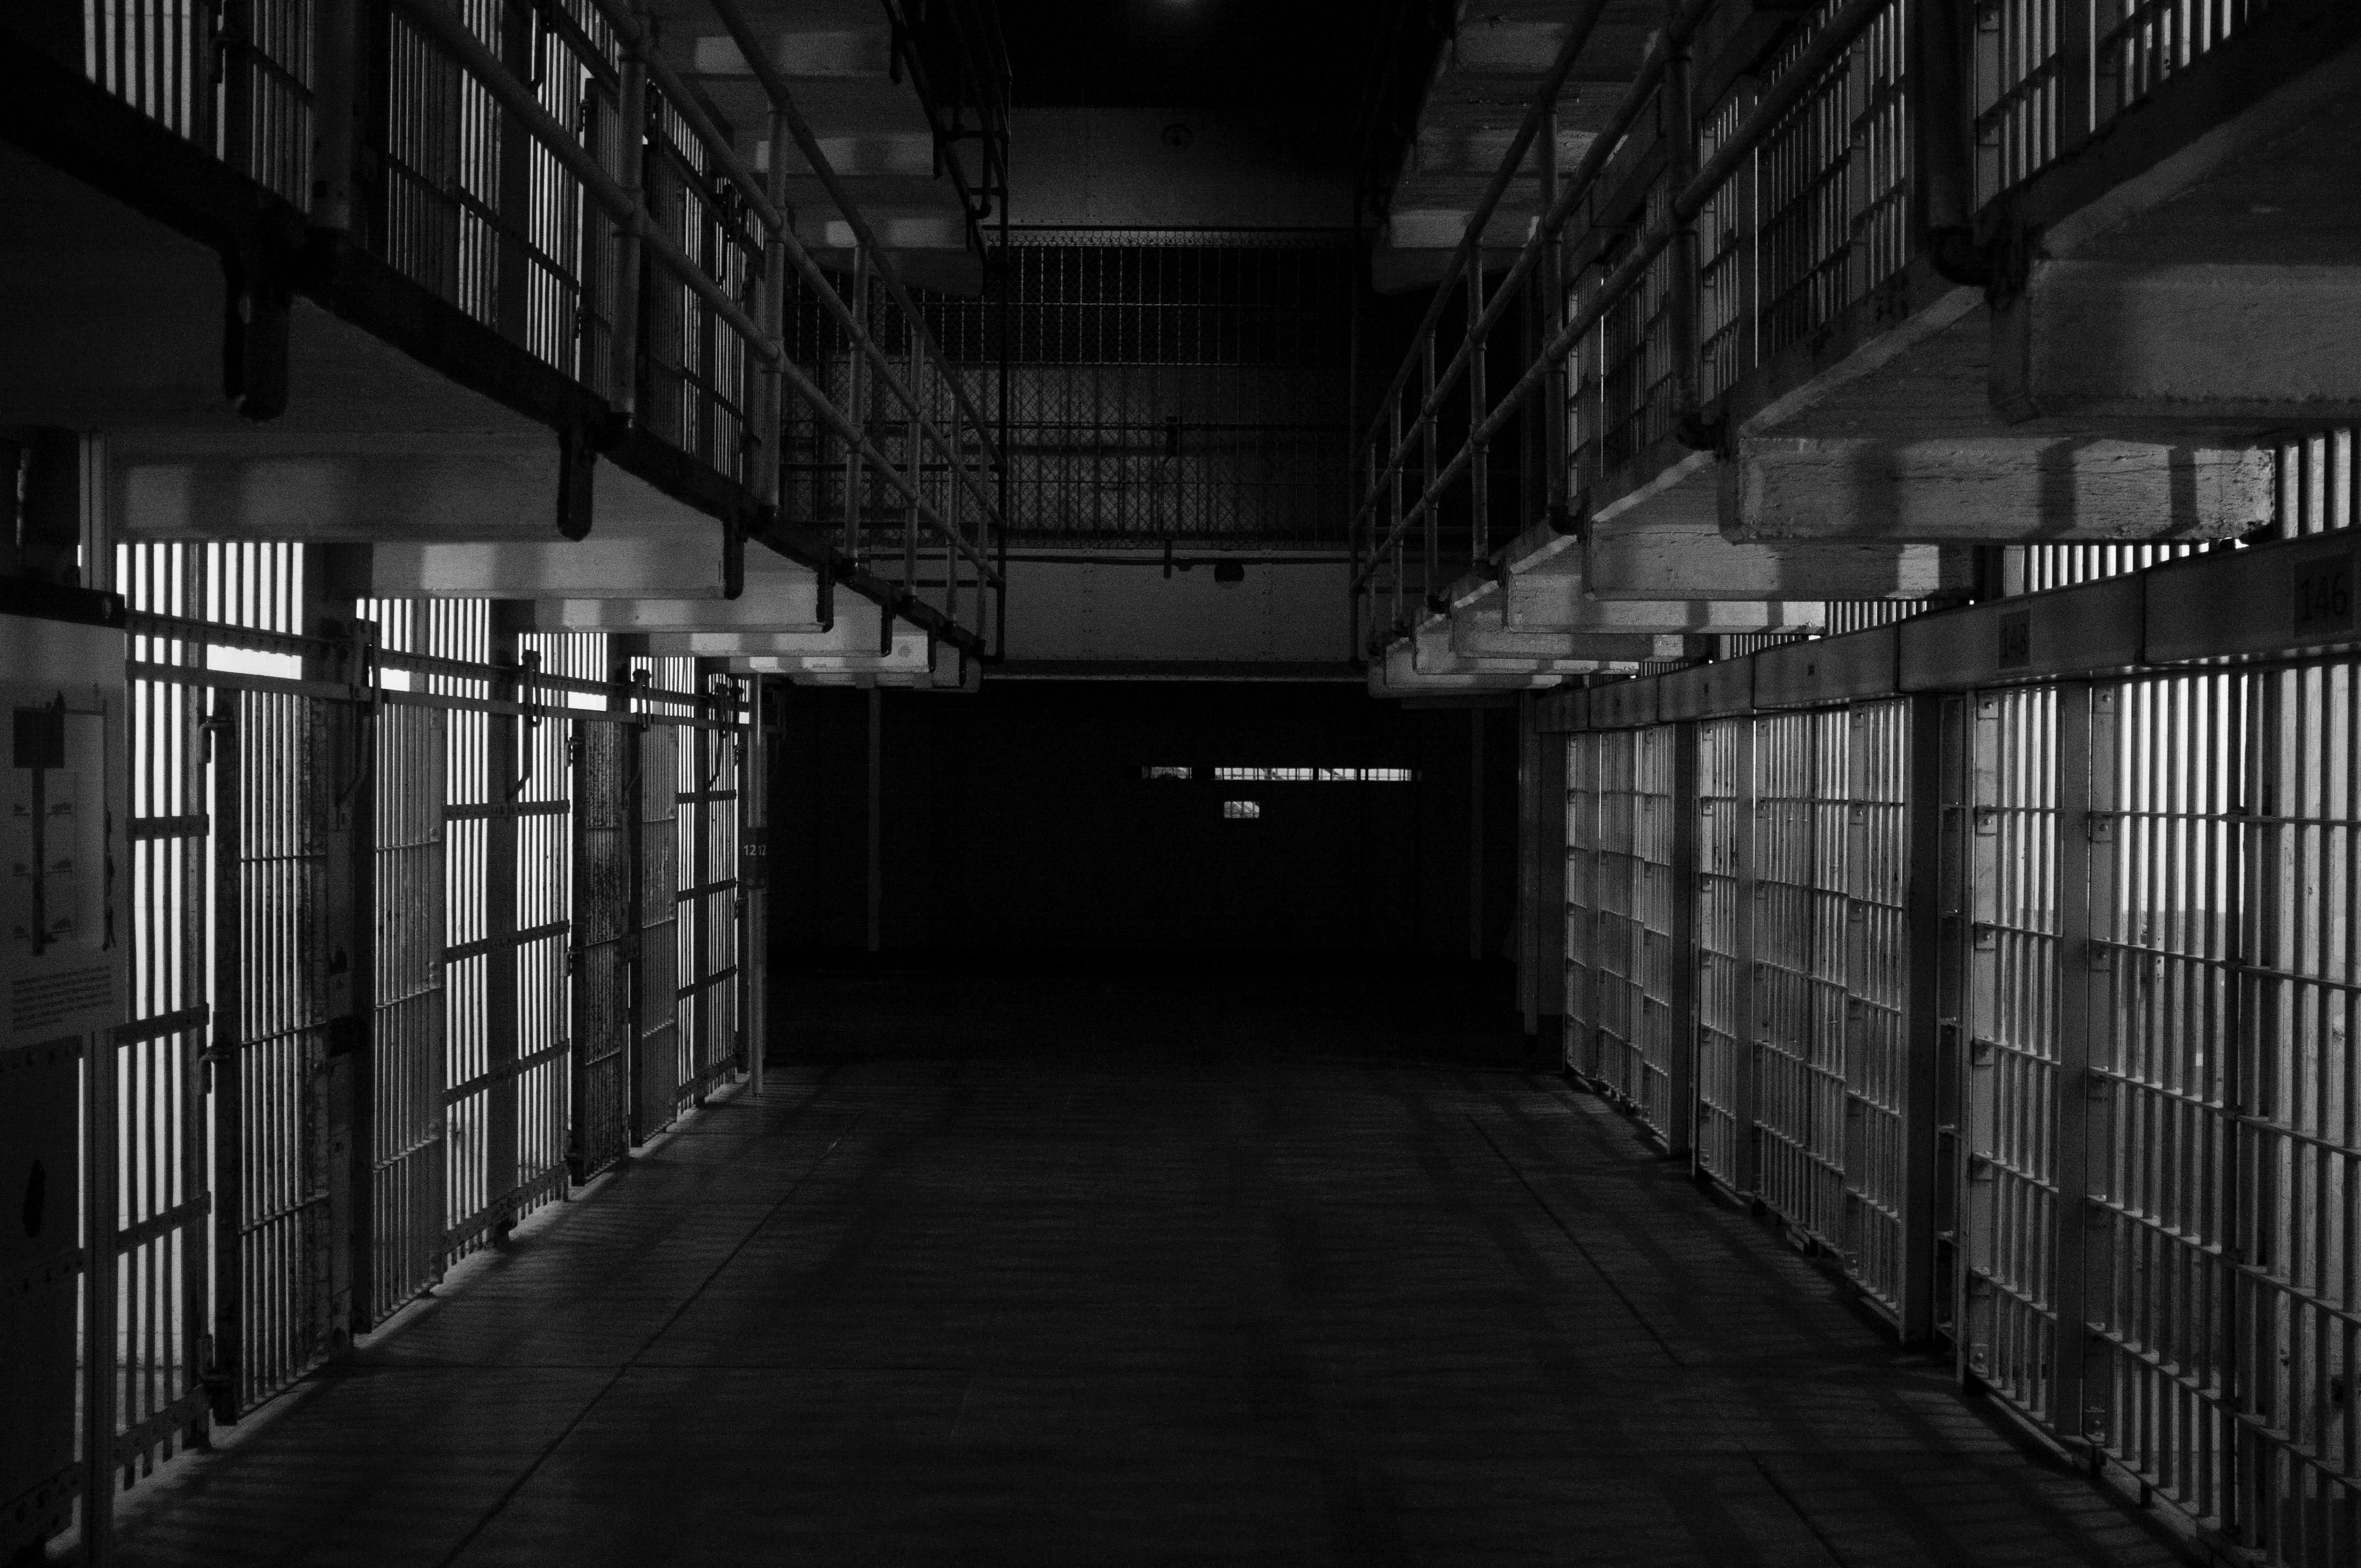 Row of jail cells; image by Emiliano Bar, via Unsplash.com.